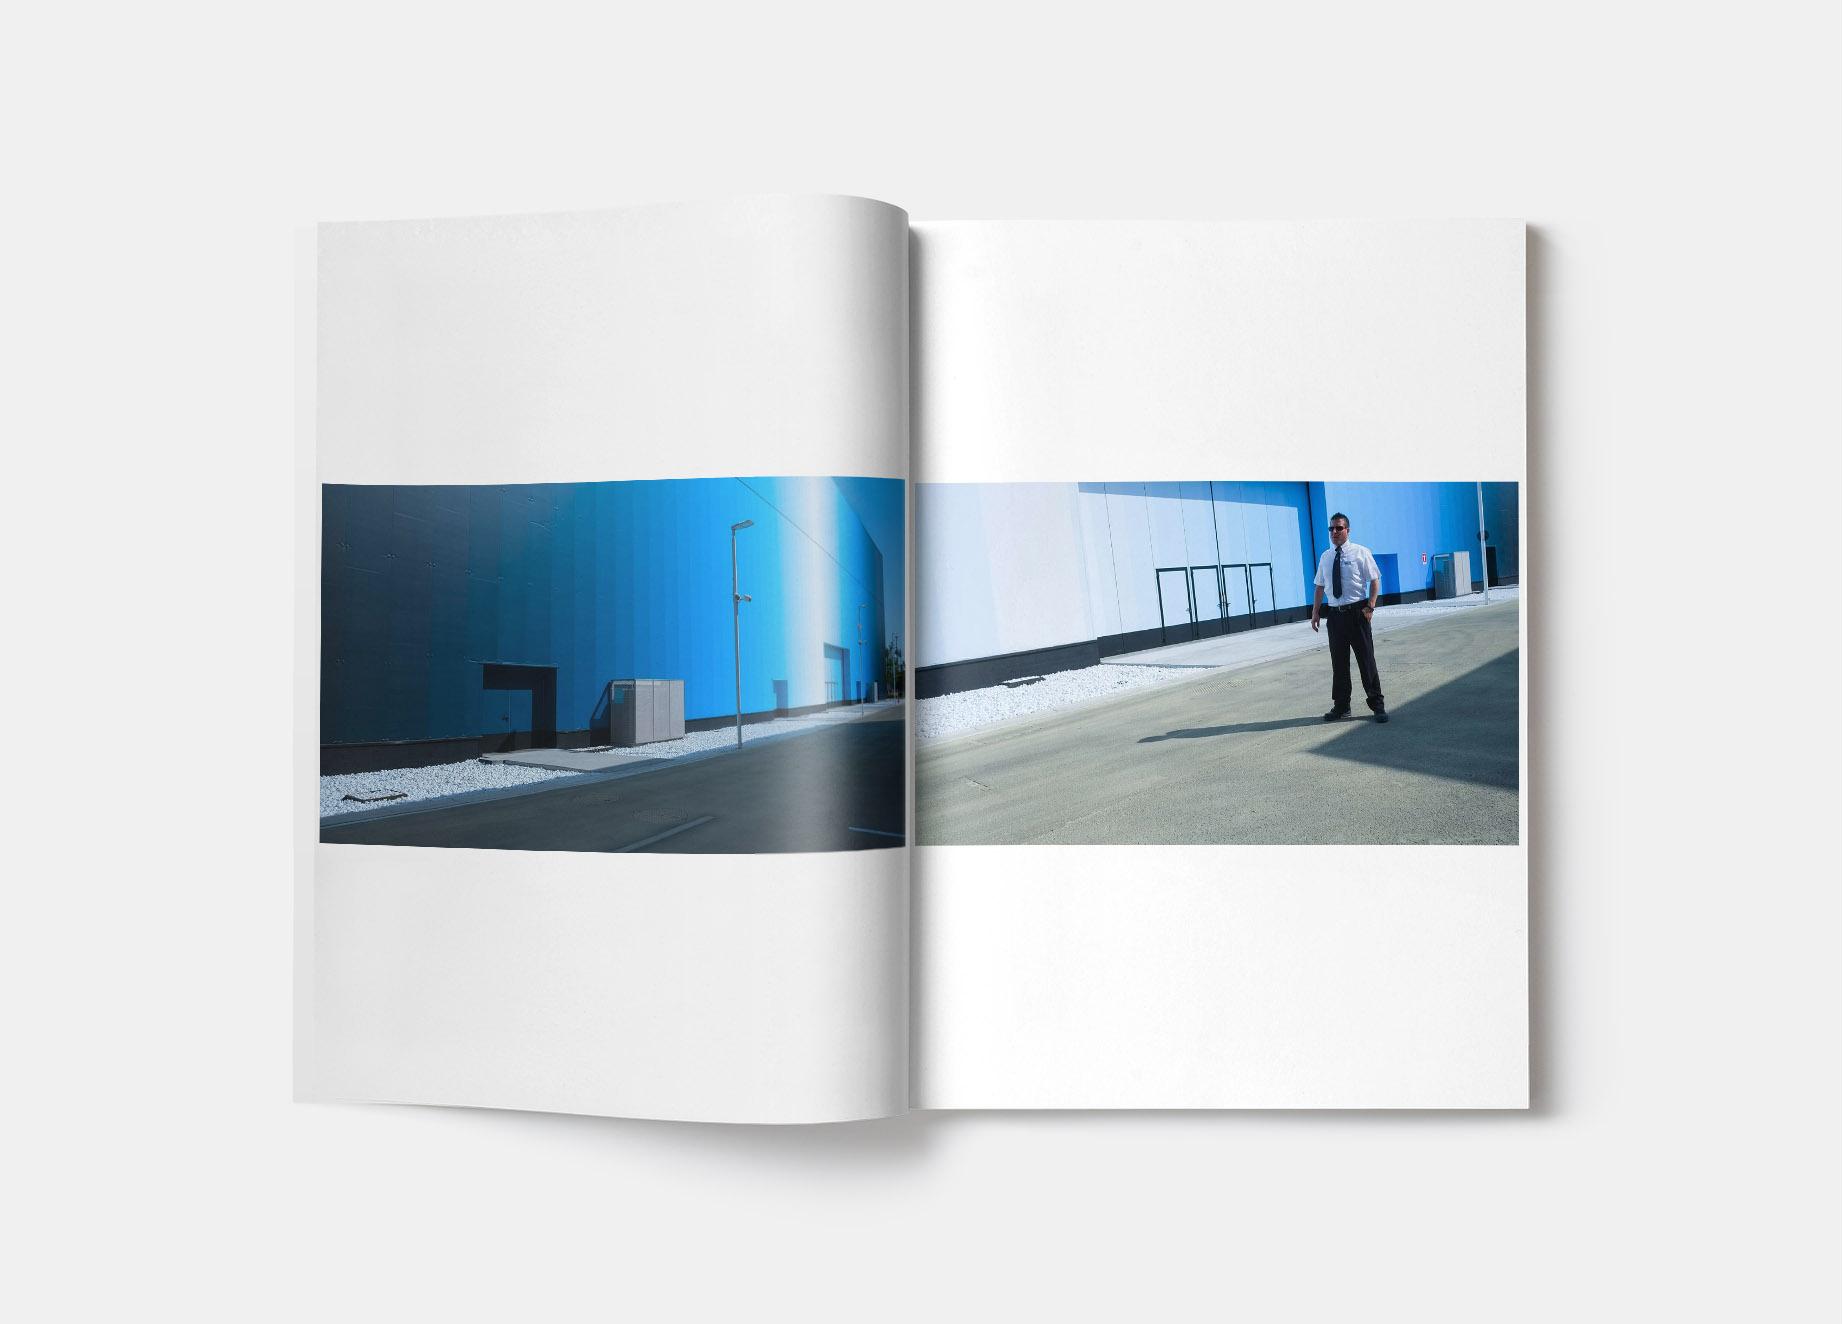 Photos de l'exposition universelle de Milan en 2015, création de contenu, Sakkamoto agence de création de contenu de marque.. Photos Laurent Scavone